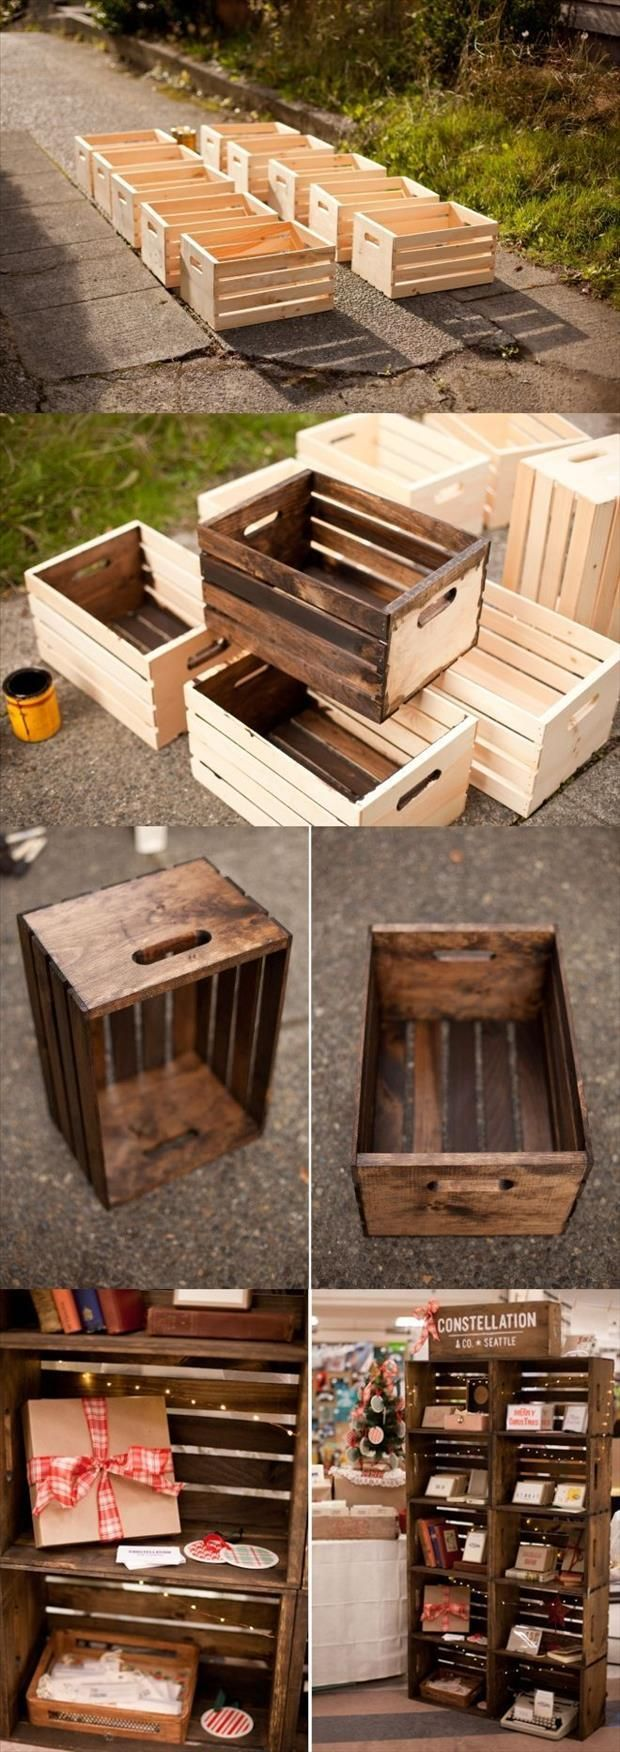 wooden crates furniture 16